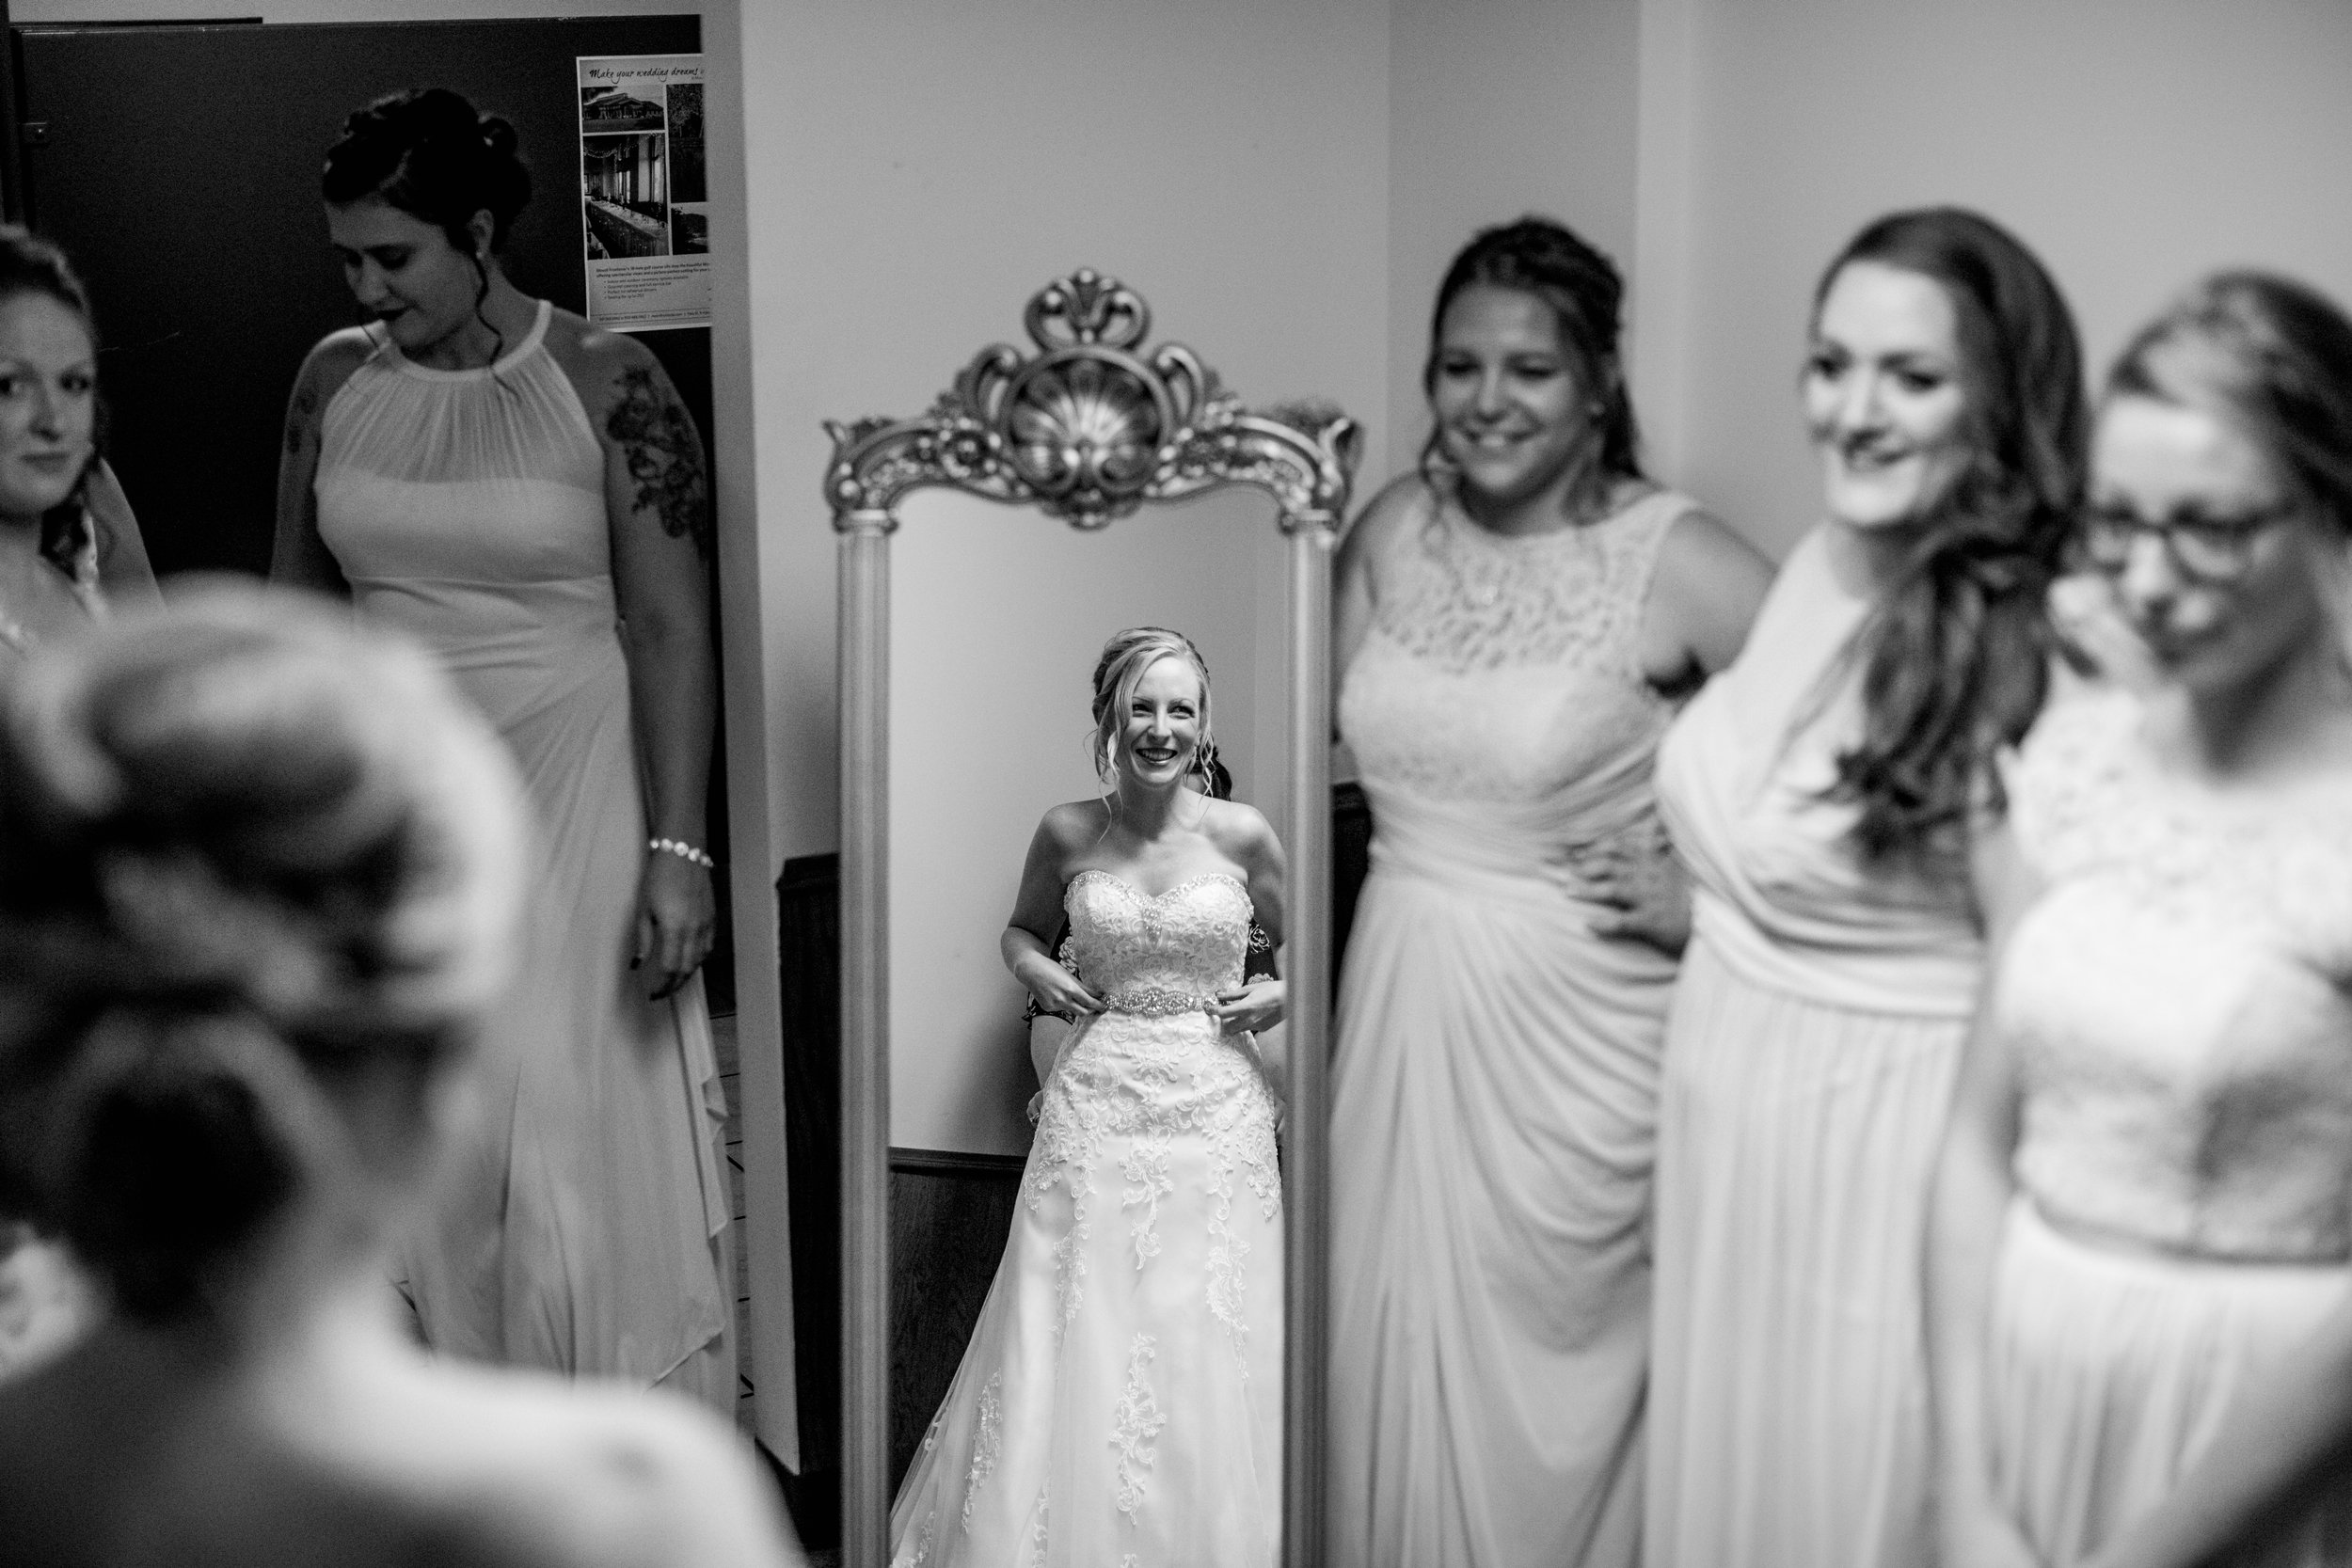 Bridal Portrait: Bridesmaids First Look - Hove Photography LLC - Destination Wedding Photographer